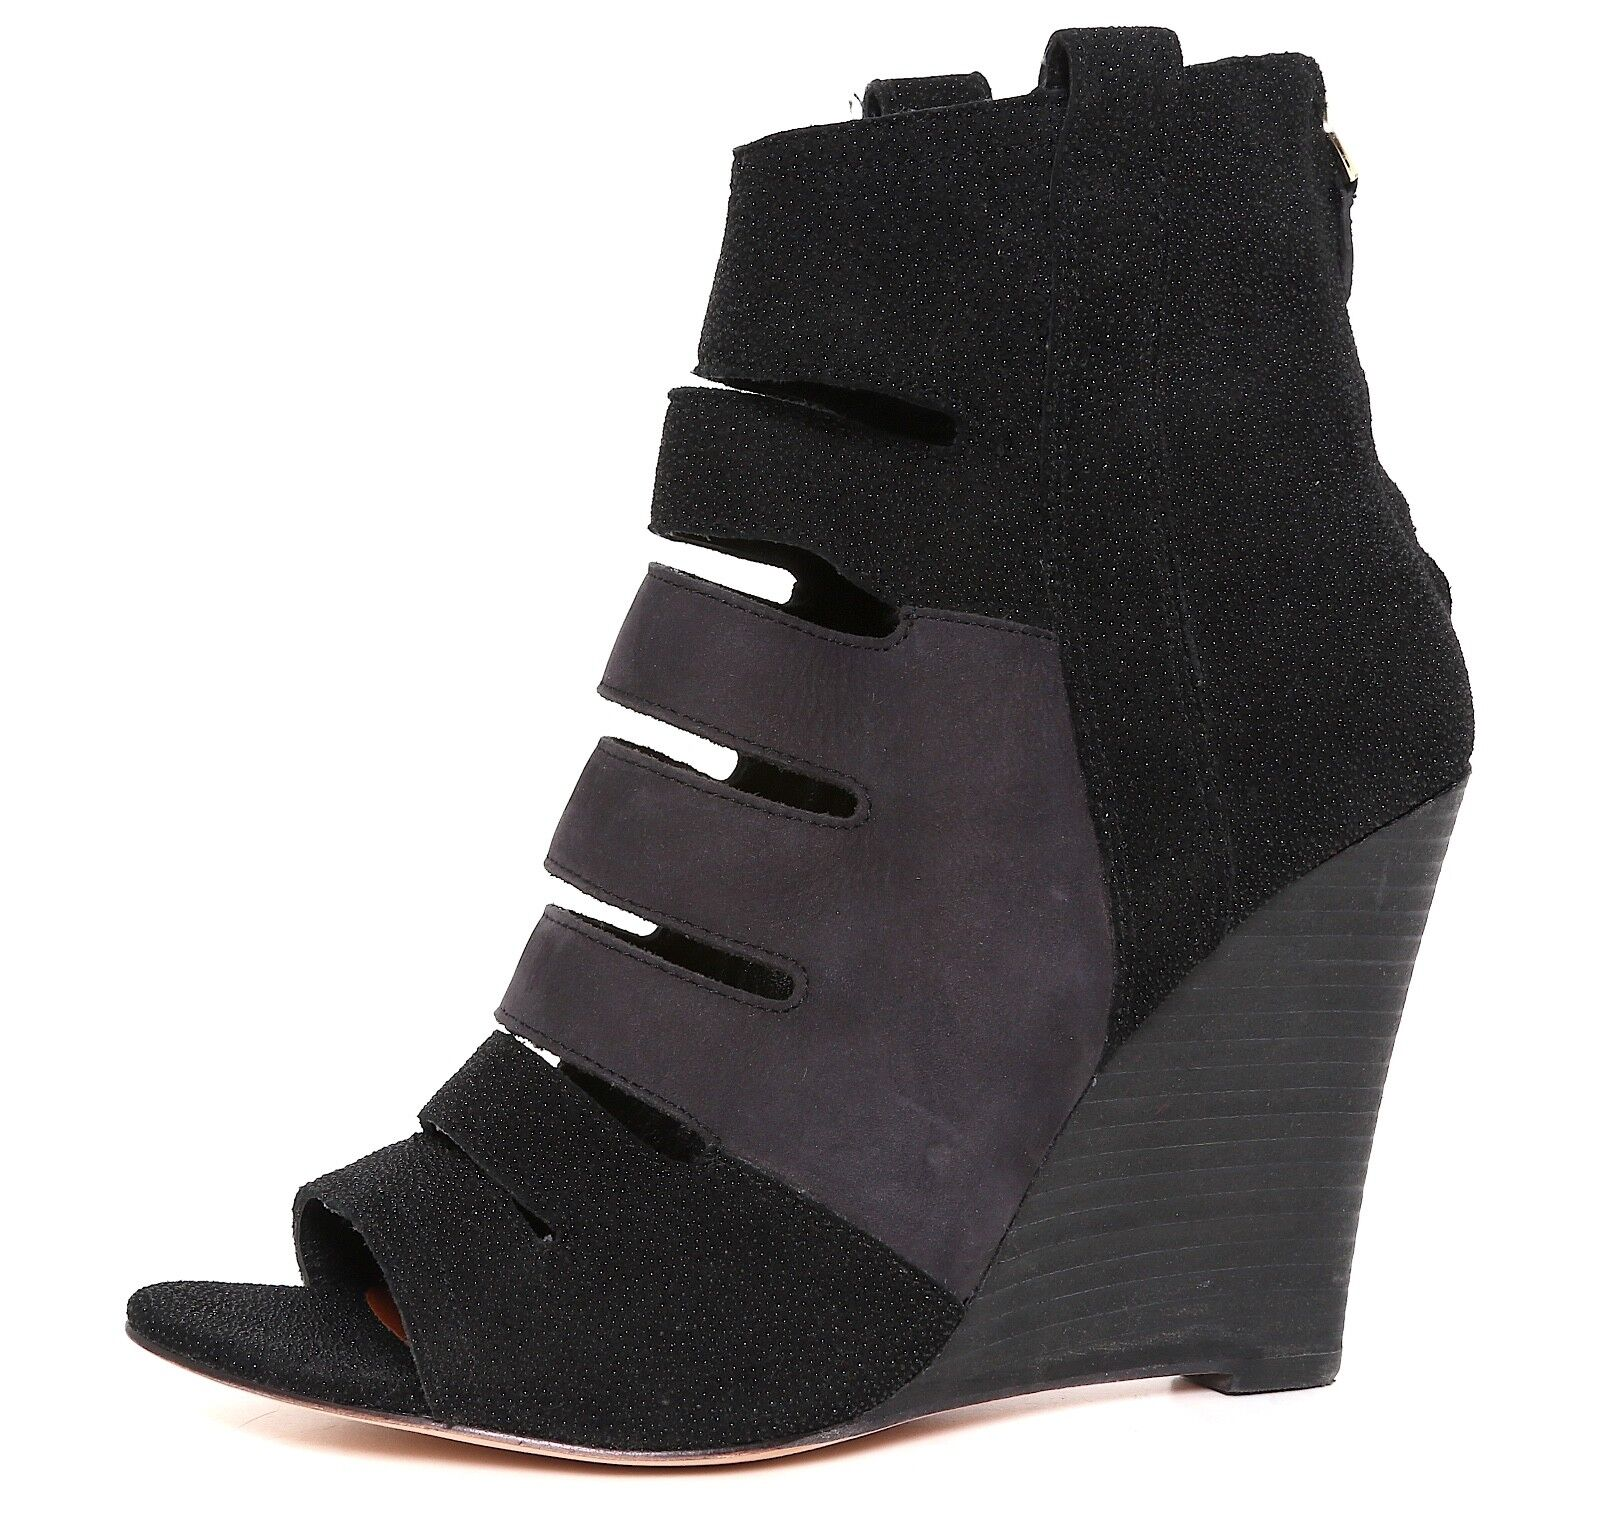 Rebecca Minkoff Pebbled Leather Peep Toe Wedge Bootie Black Women Sz 8M 1214